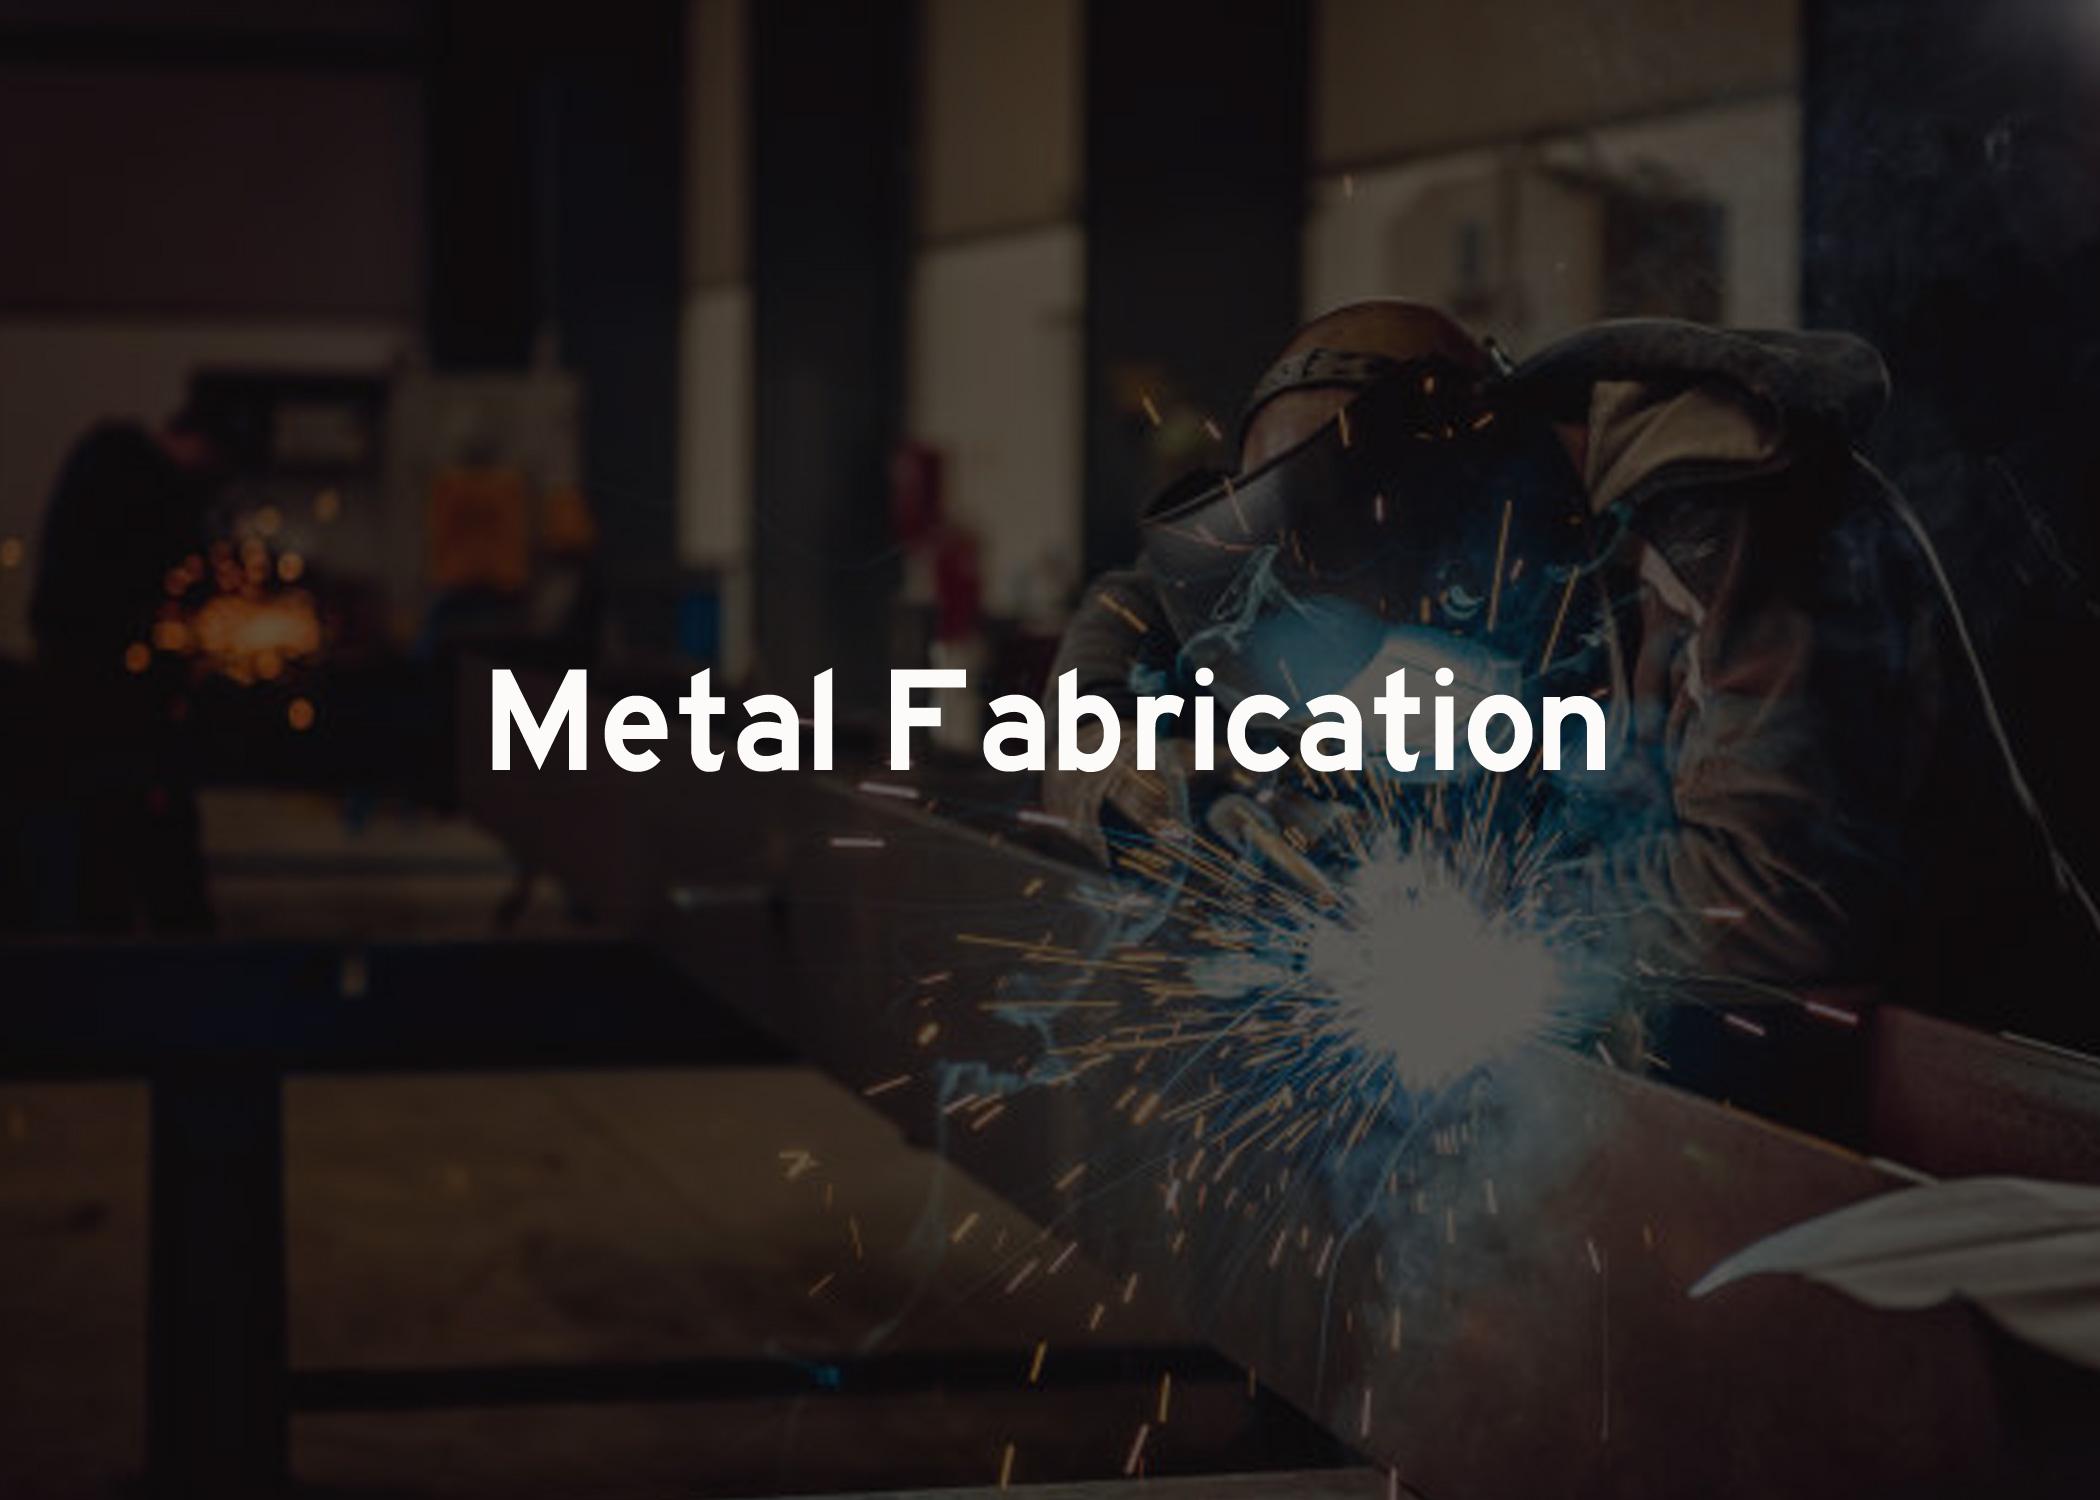 Metal-Fabrication-Thumbnail.jpg